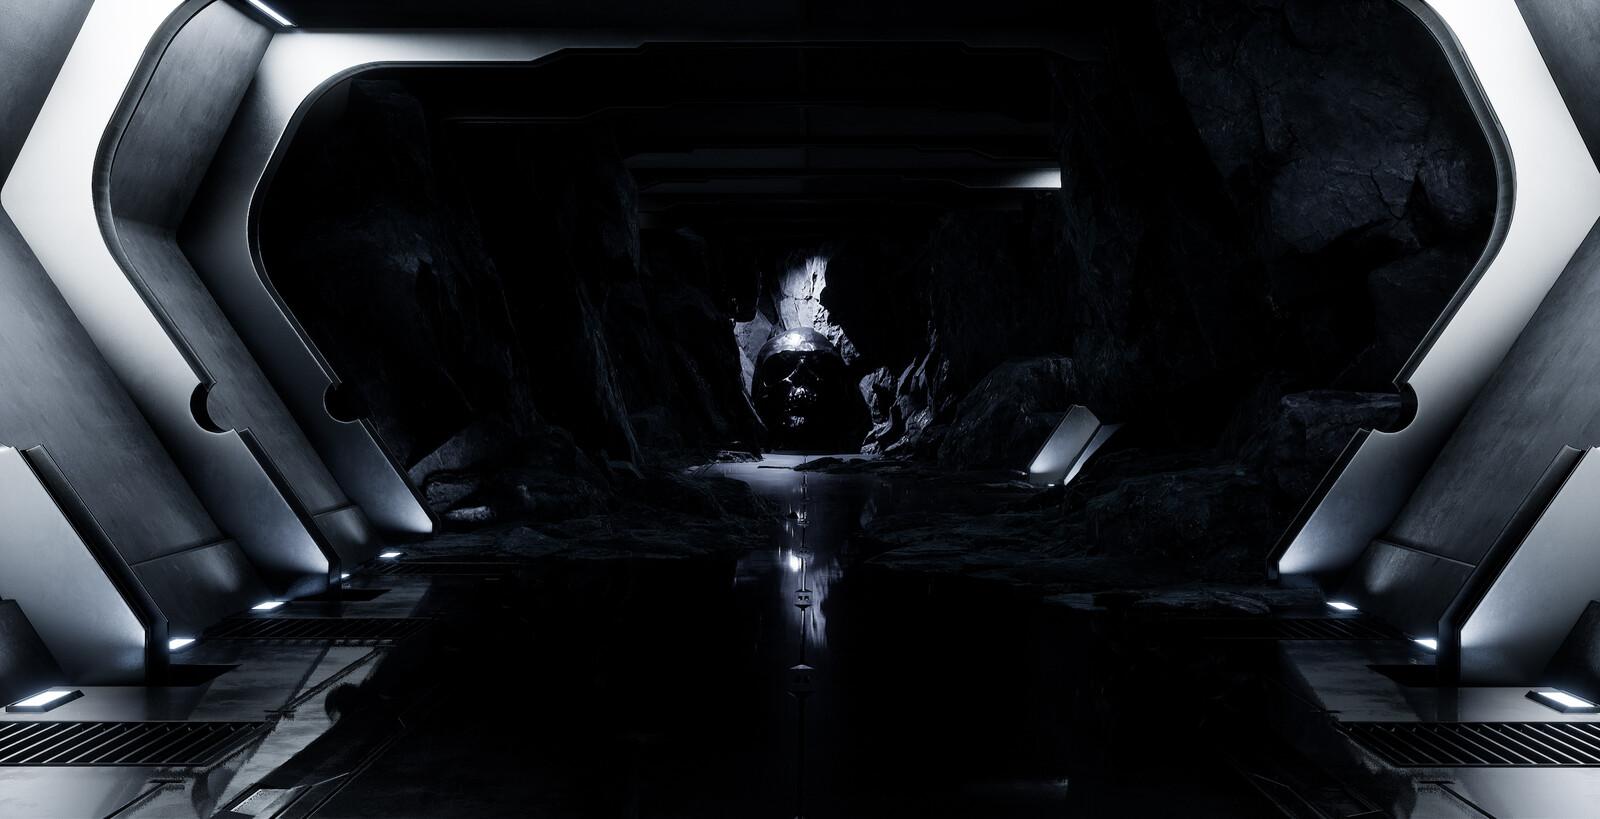 Skull Series #2: Underground Tunnel